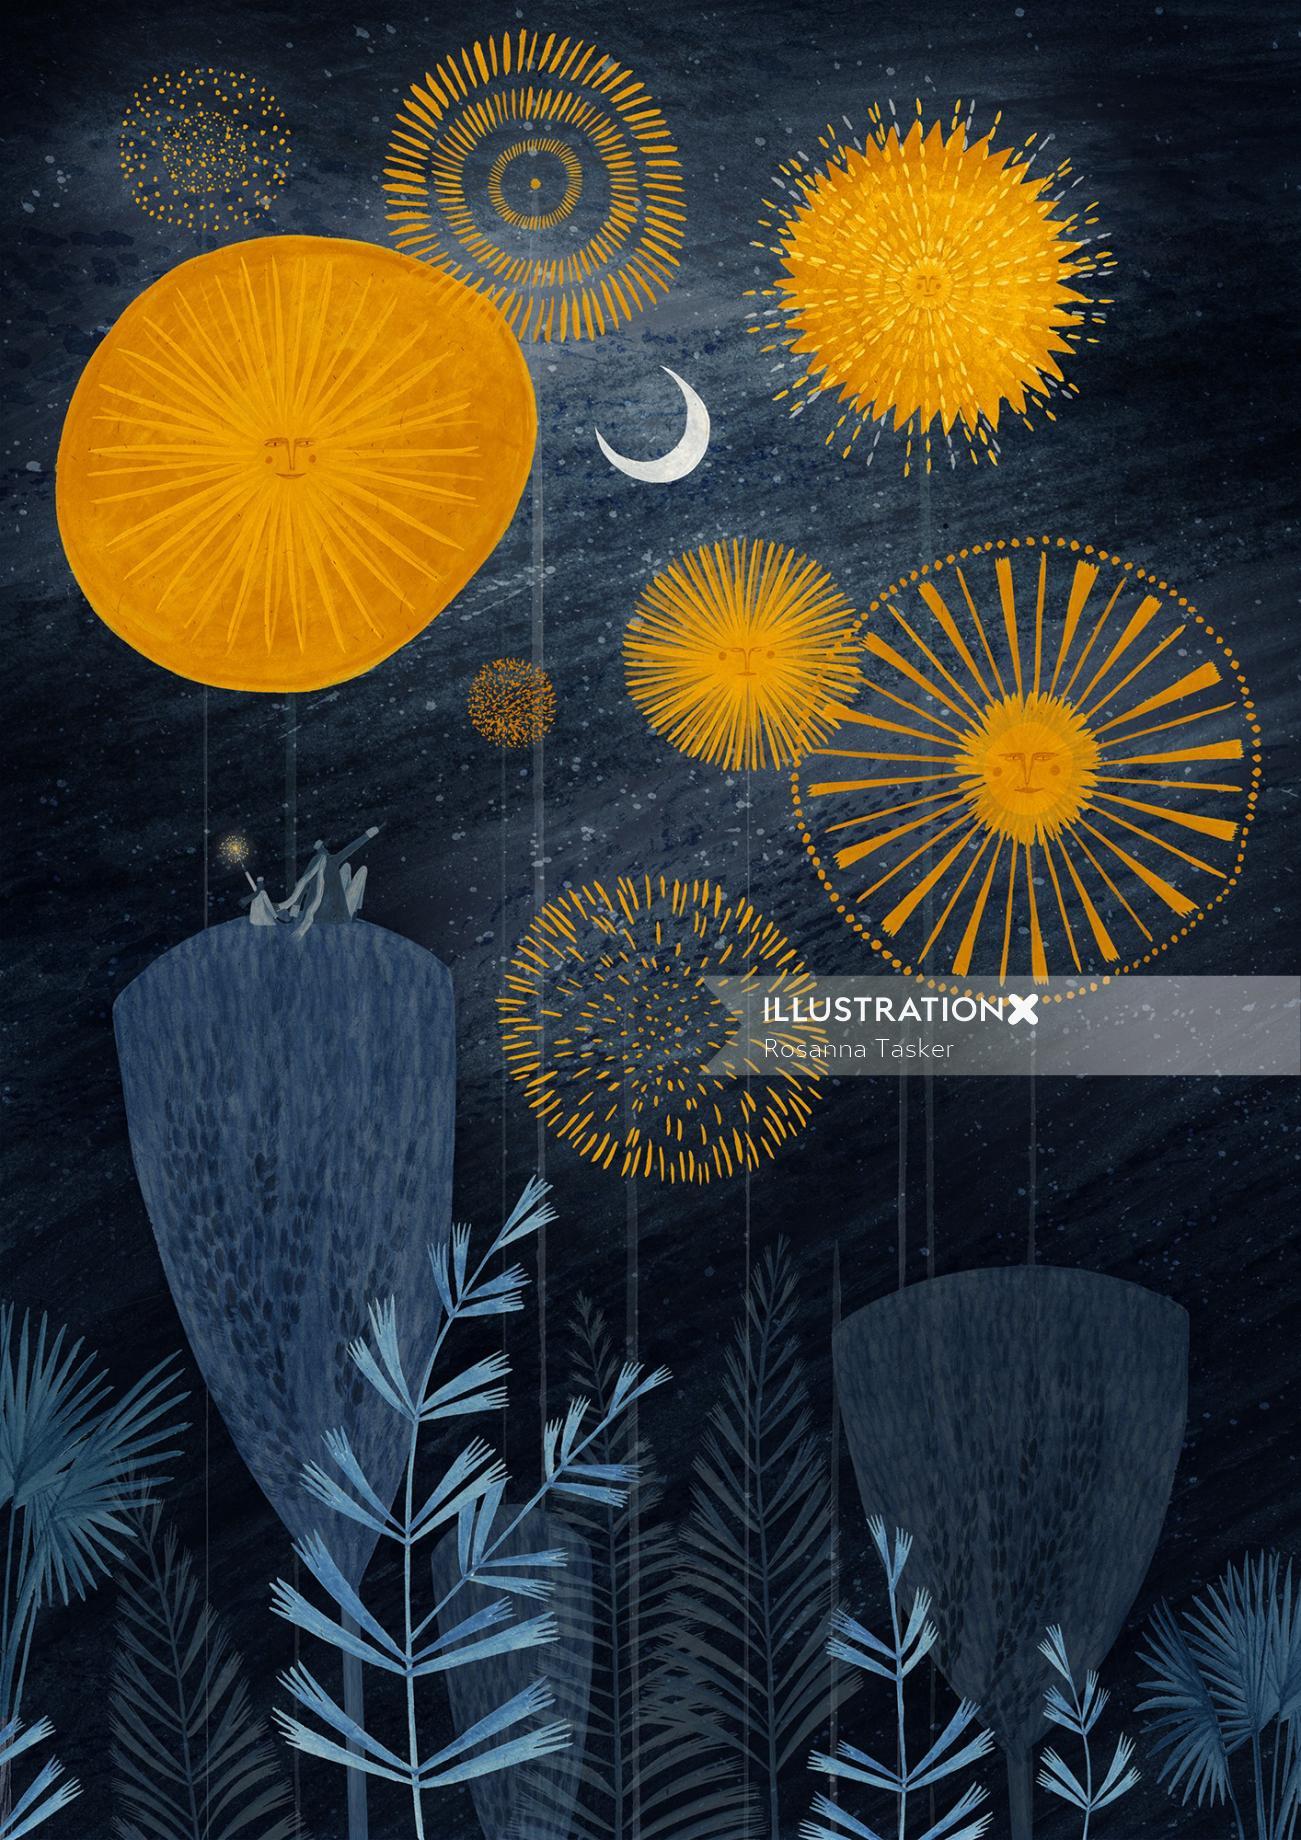 fireworks, firework, bonfire, bonfire night, night time, magic, stars, planets